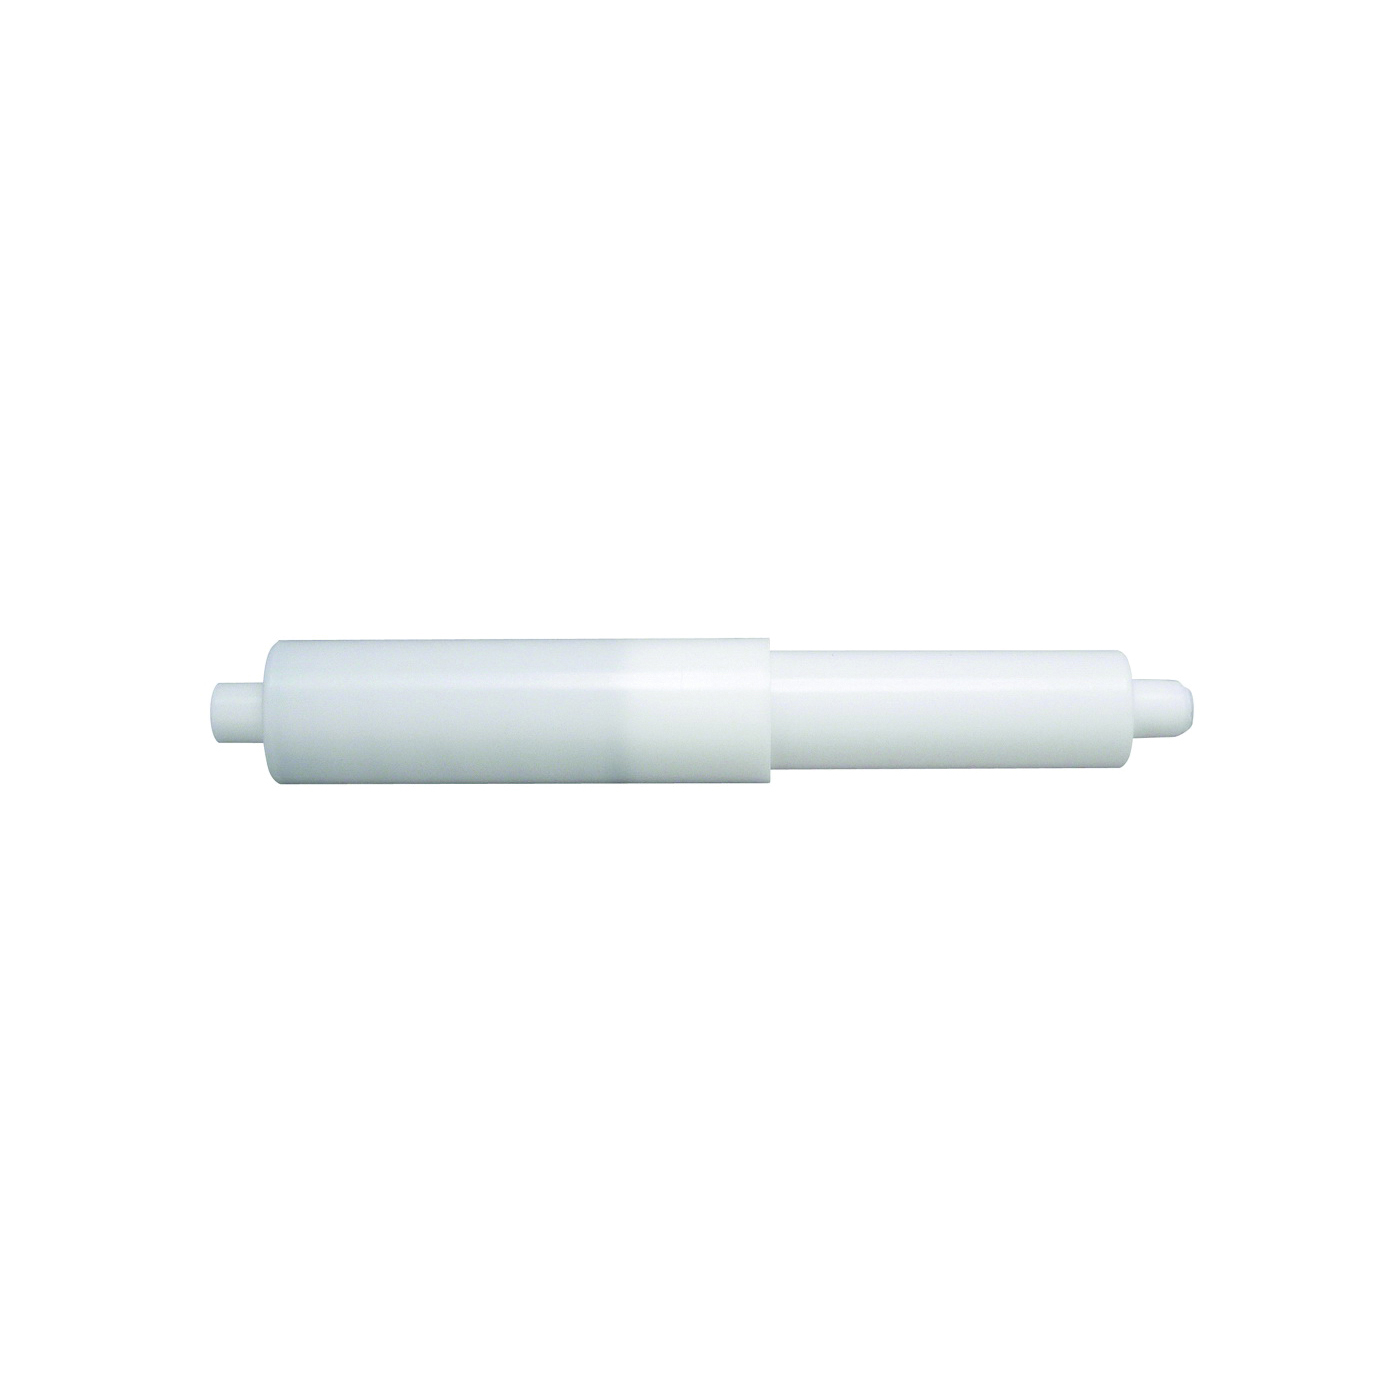 Picture of Plumb Pak PP835-35 Toilet Paper Roller, Plastic, White